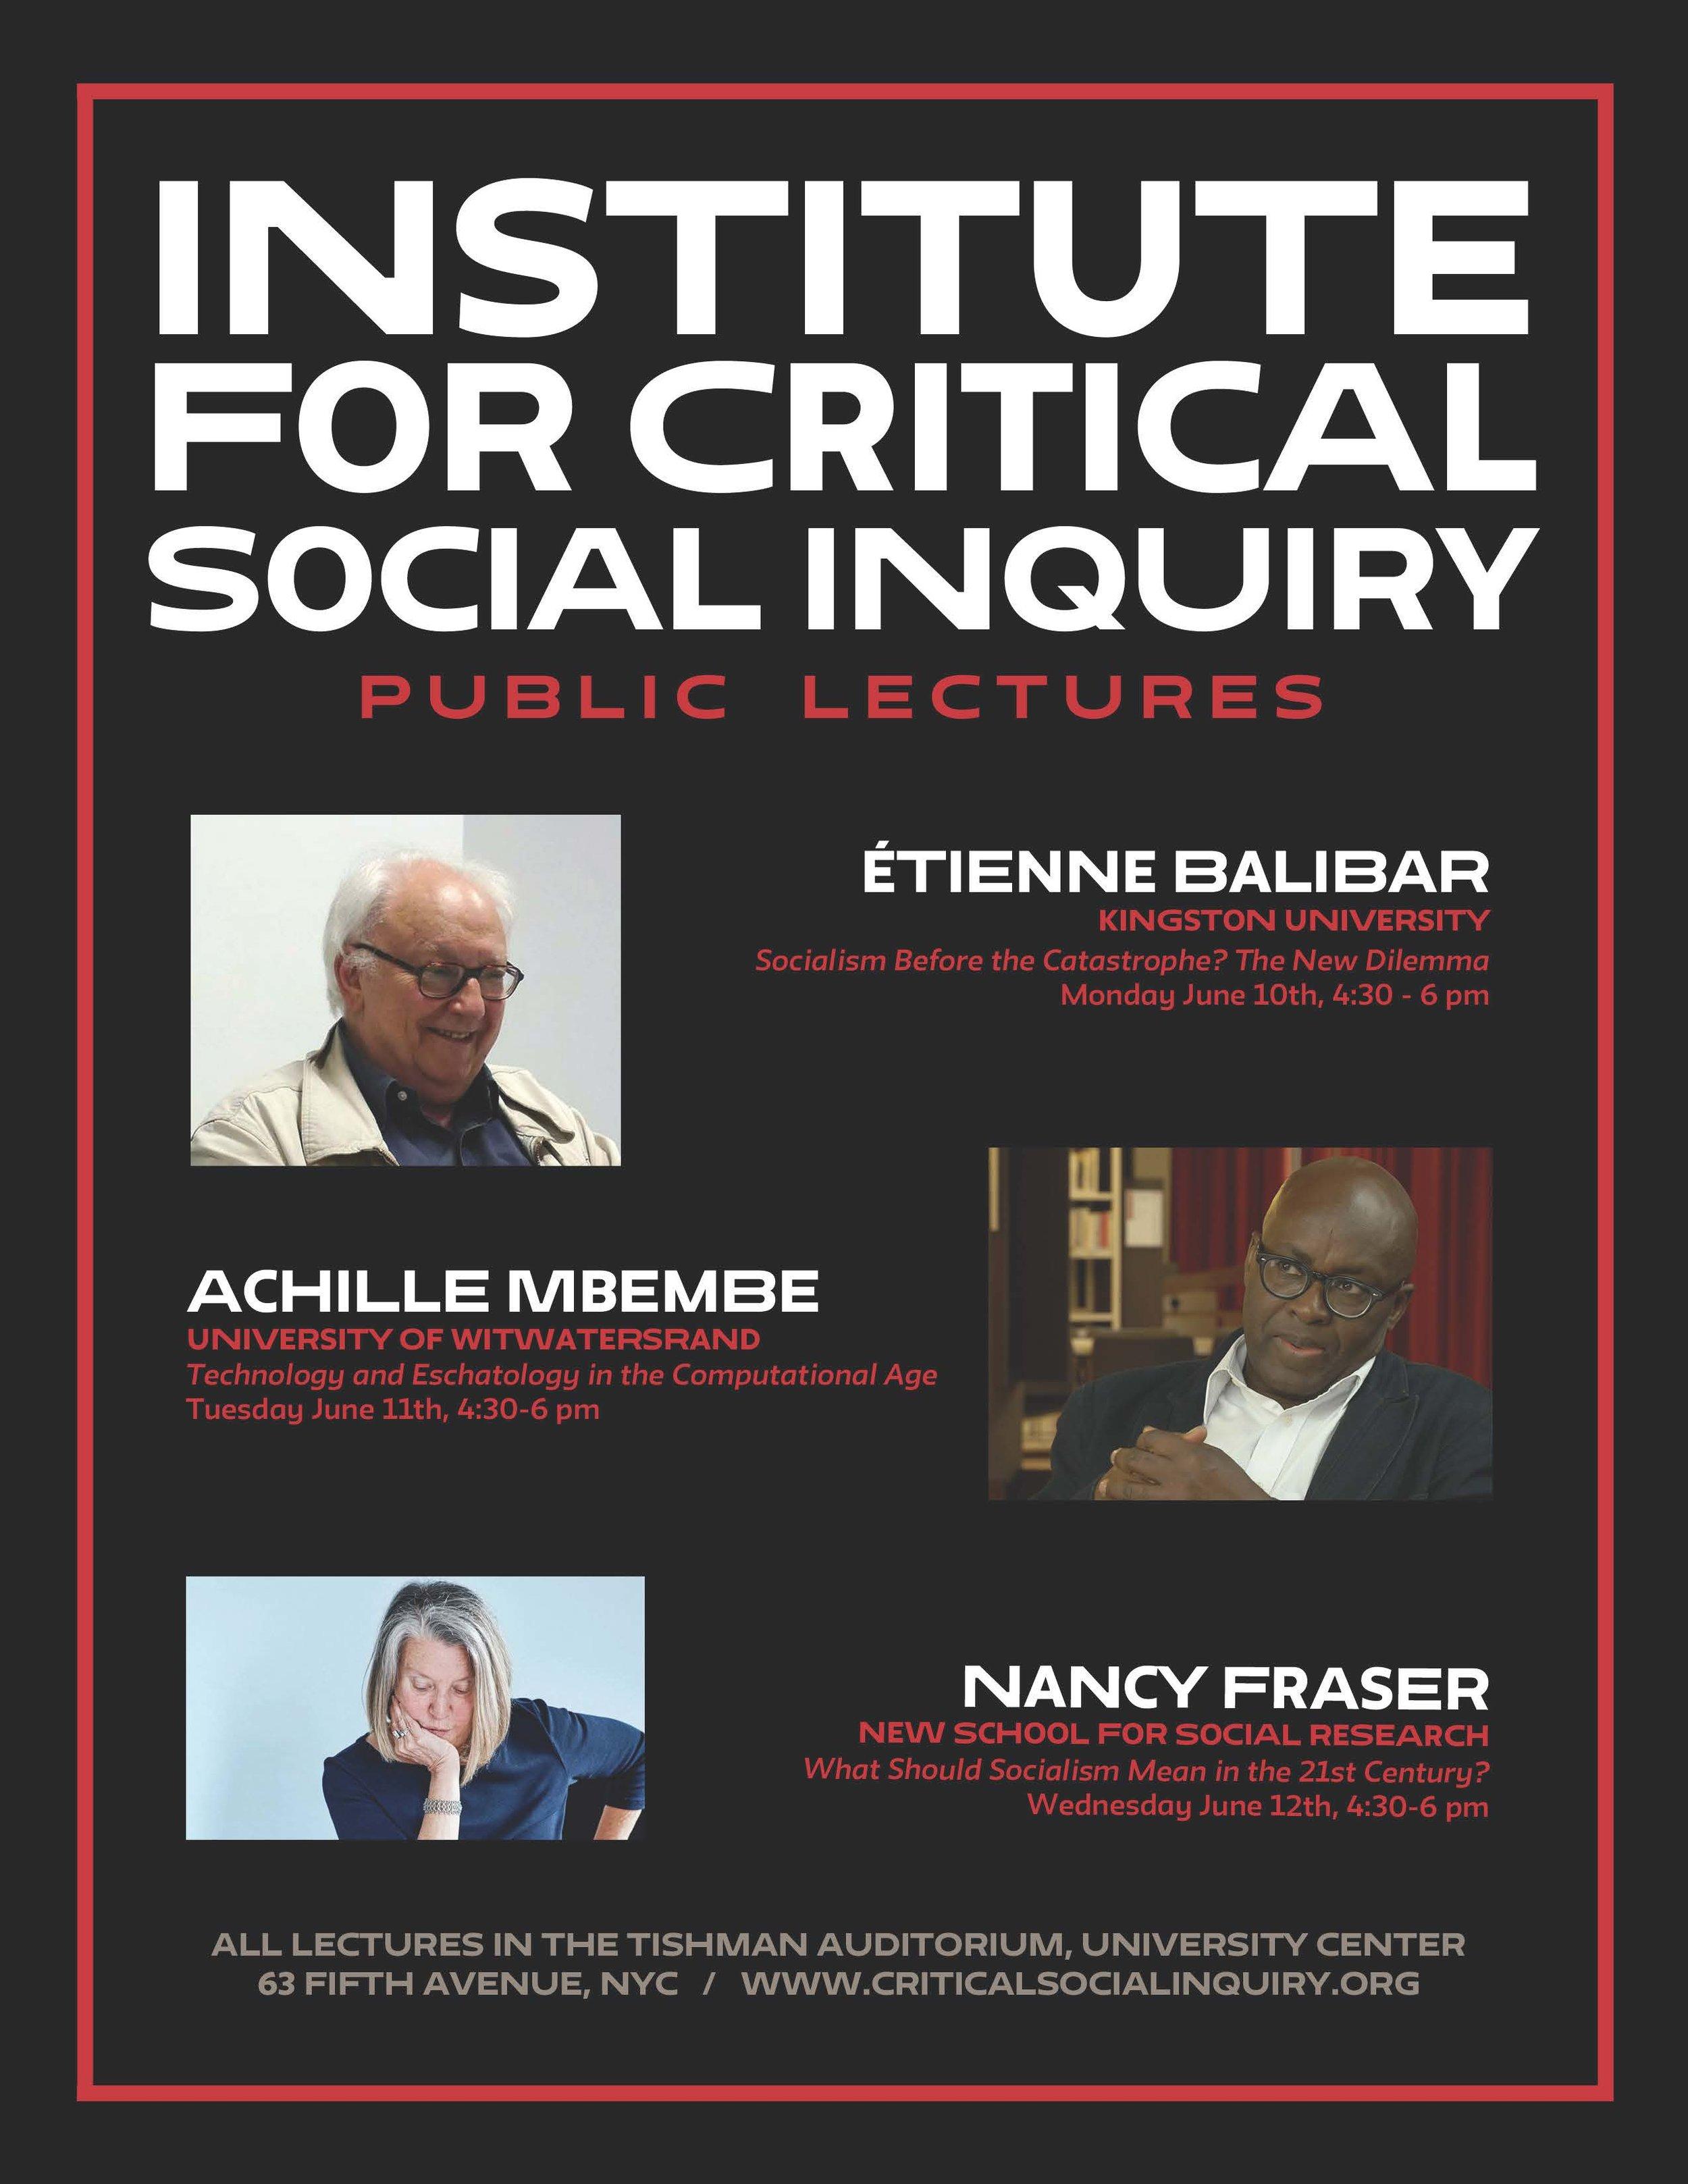 ICSI2019-public-lectures-v1a-LETTER-SIZE.jpg